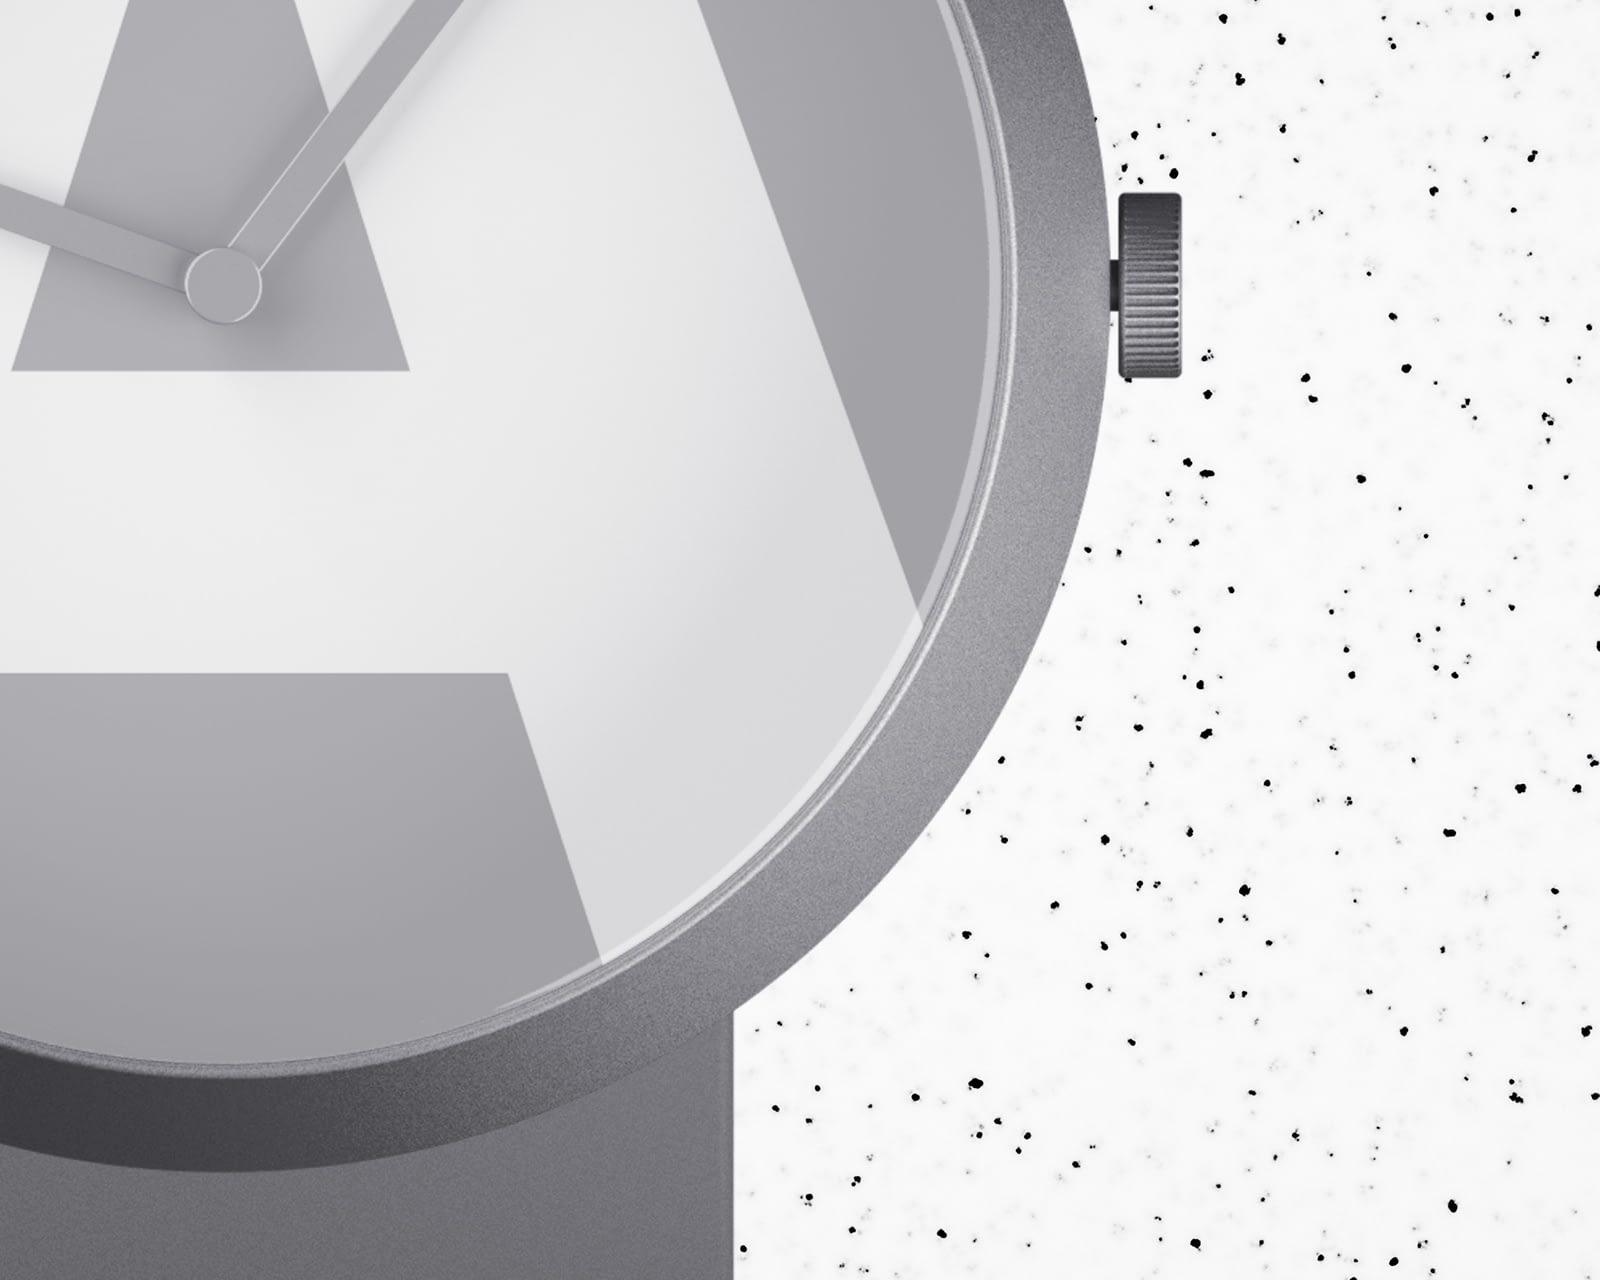 round-watch-free-mockup-close-up